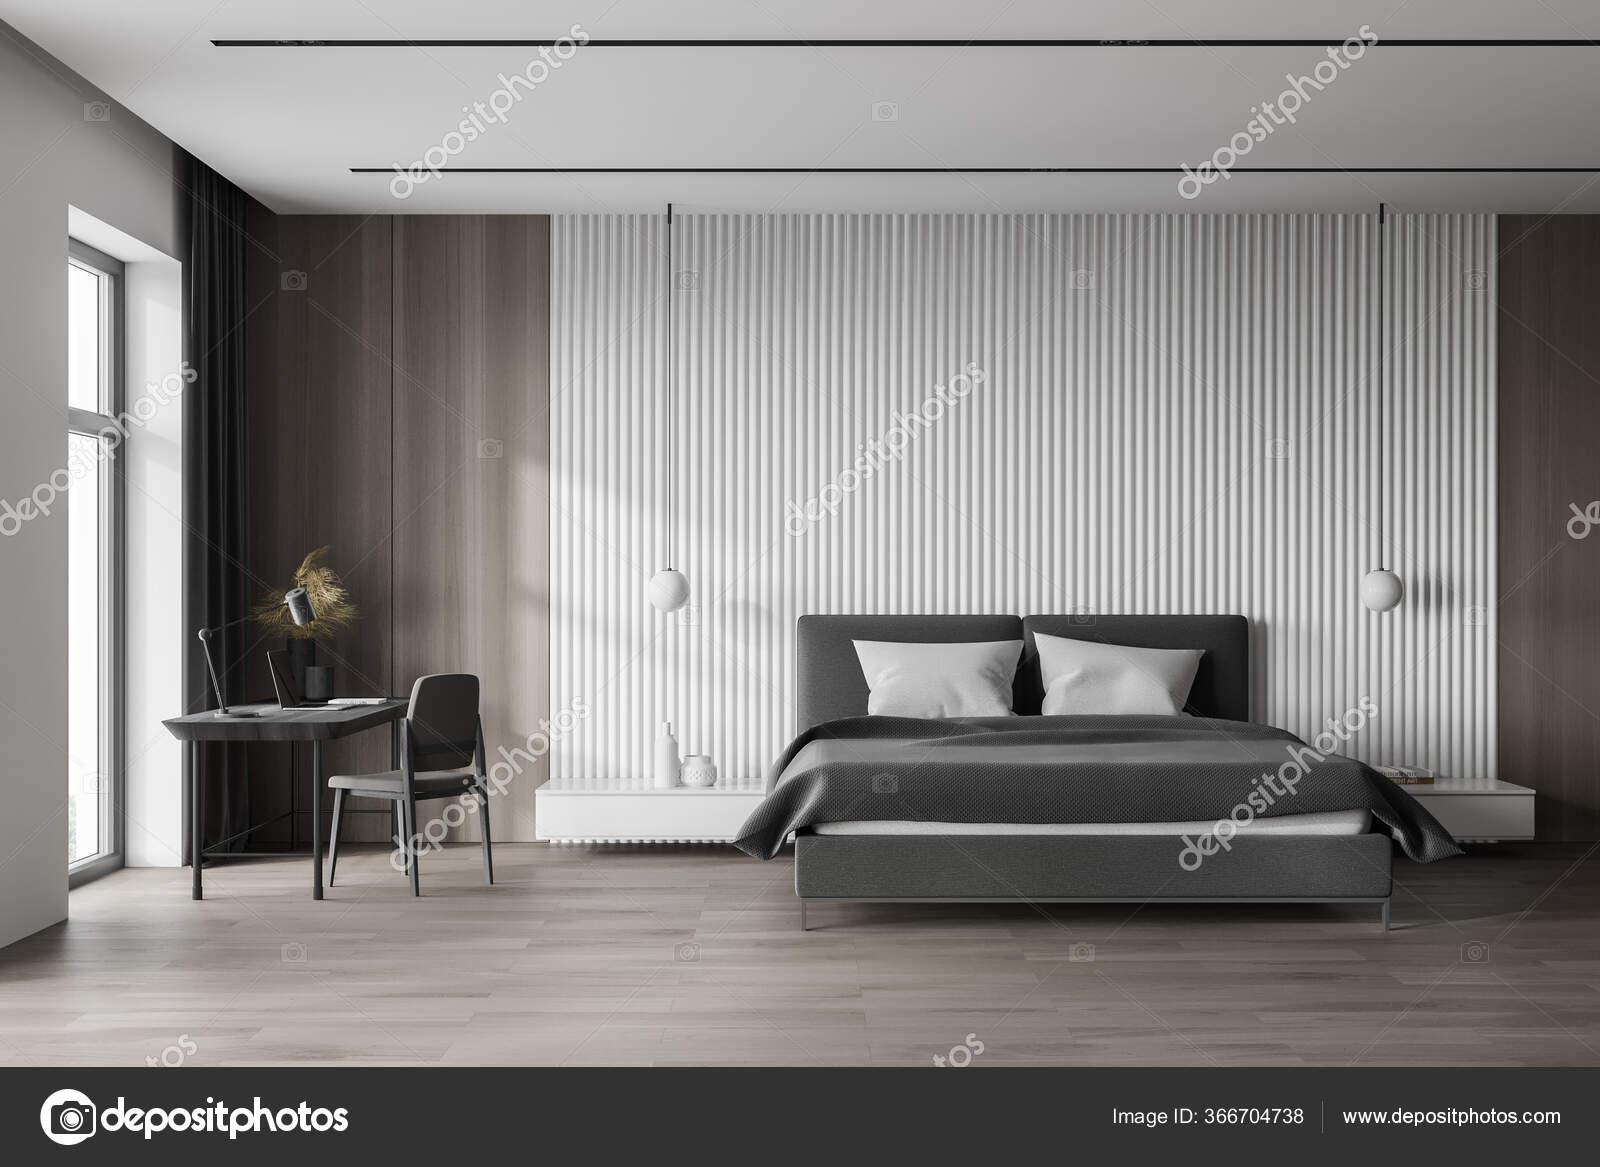 Interior Stylish Master Bedroom Scandinavian Style White Wooden Walls Wooden Stock Photo Image By C Denisismagilov 366704738